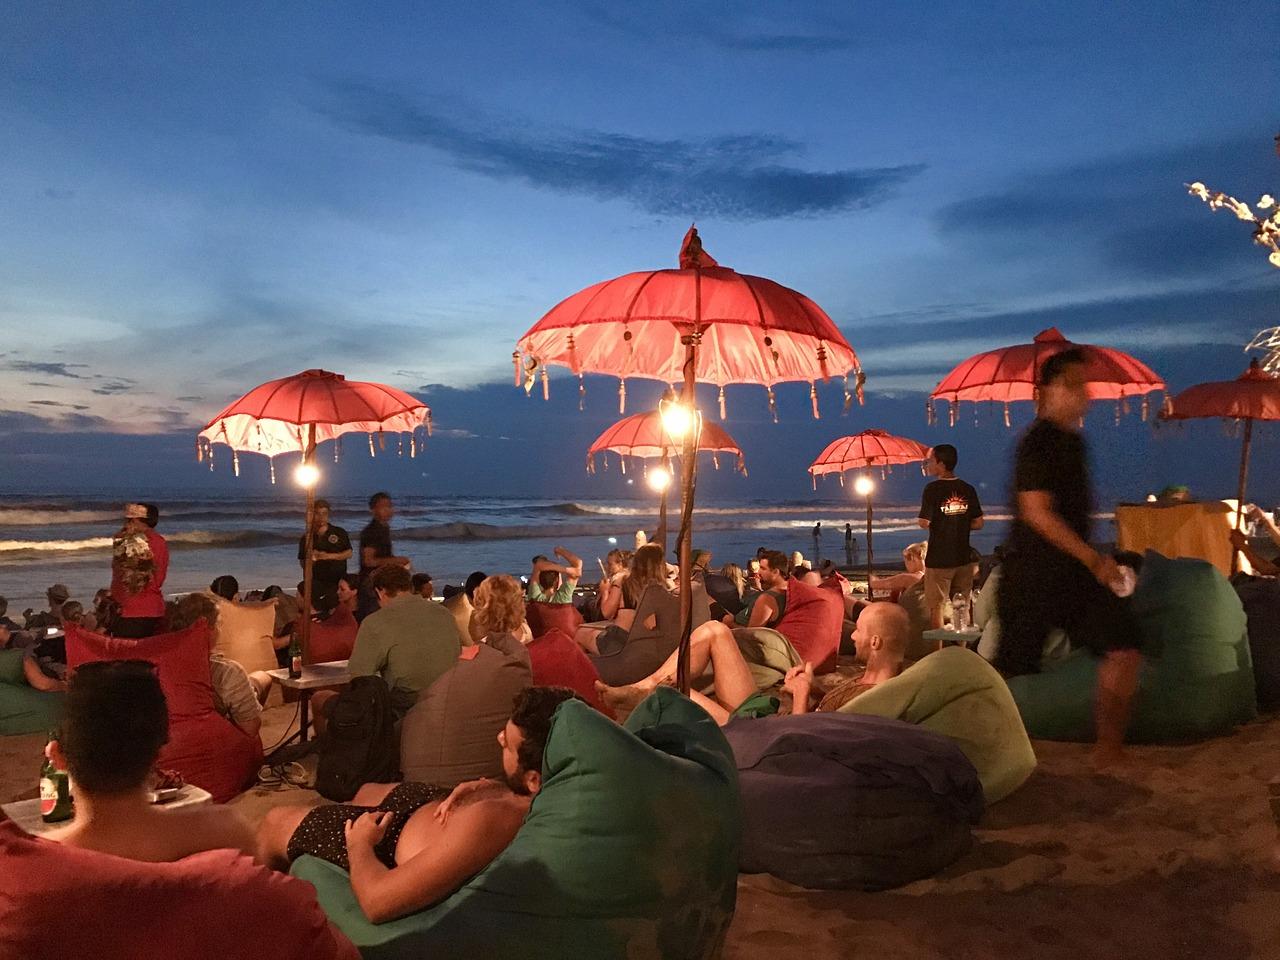 Bali and area, Indonesia